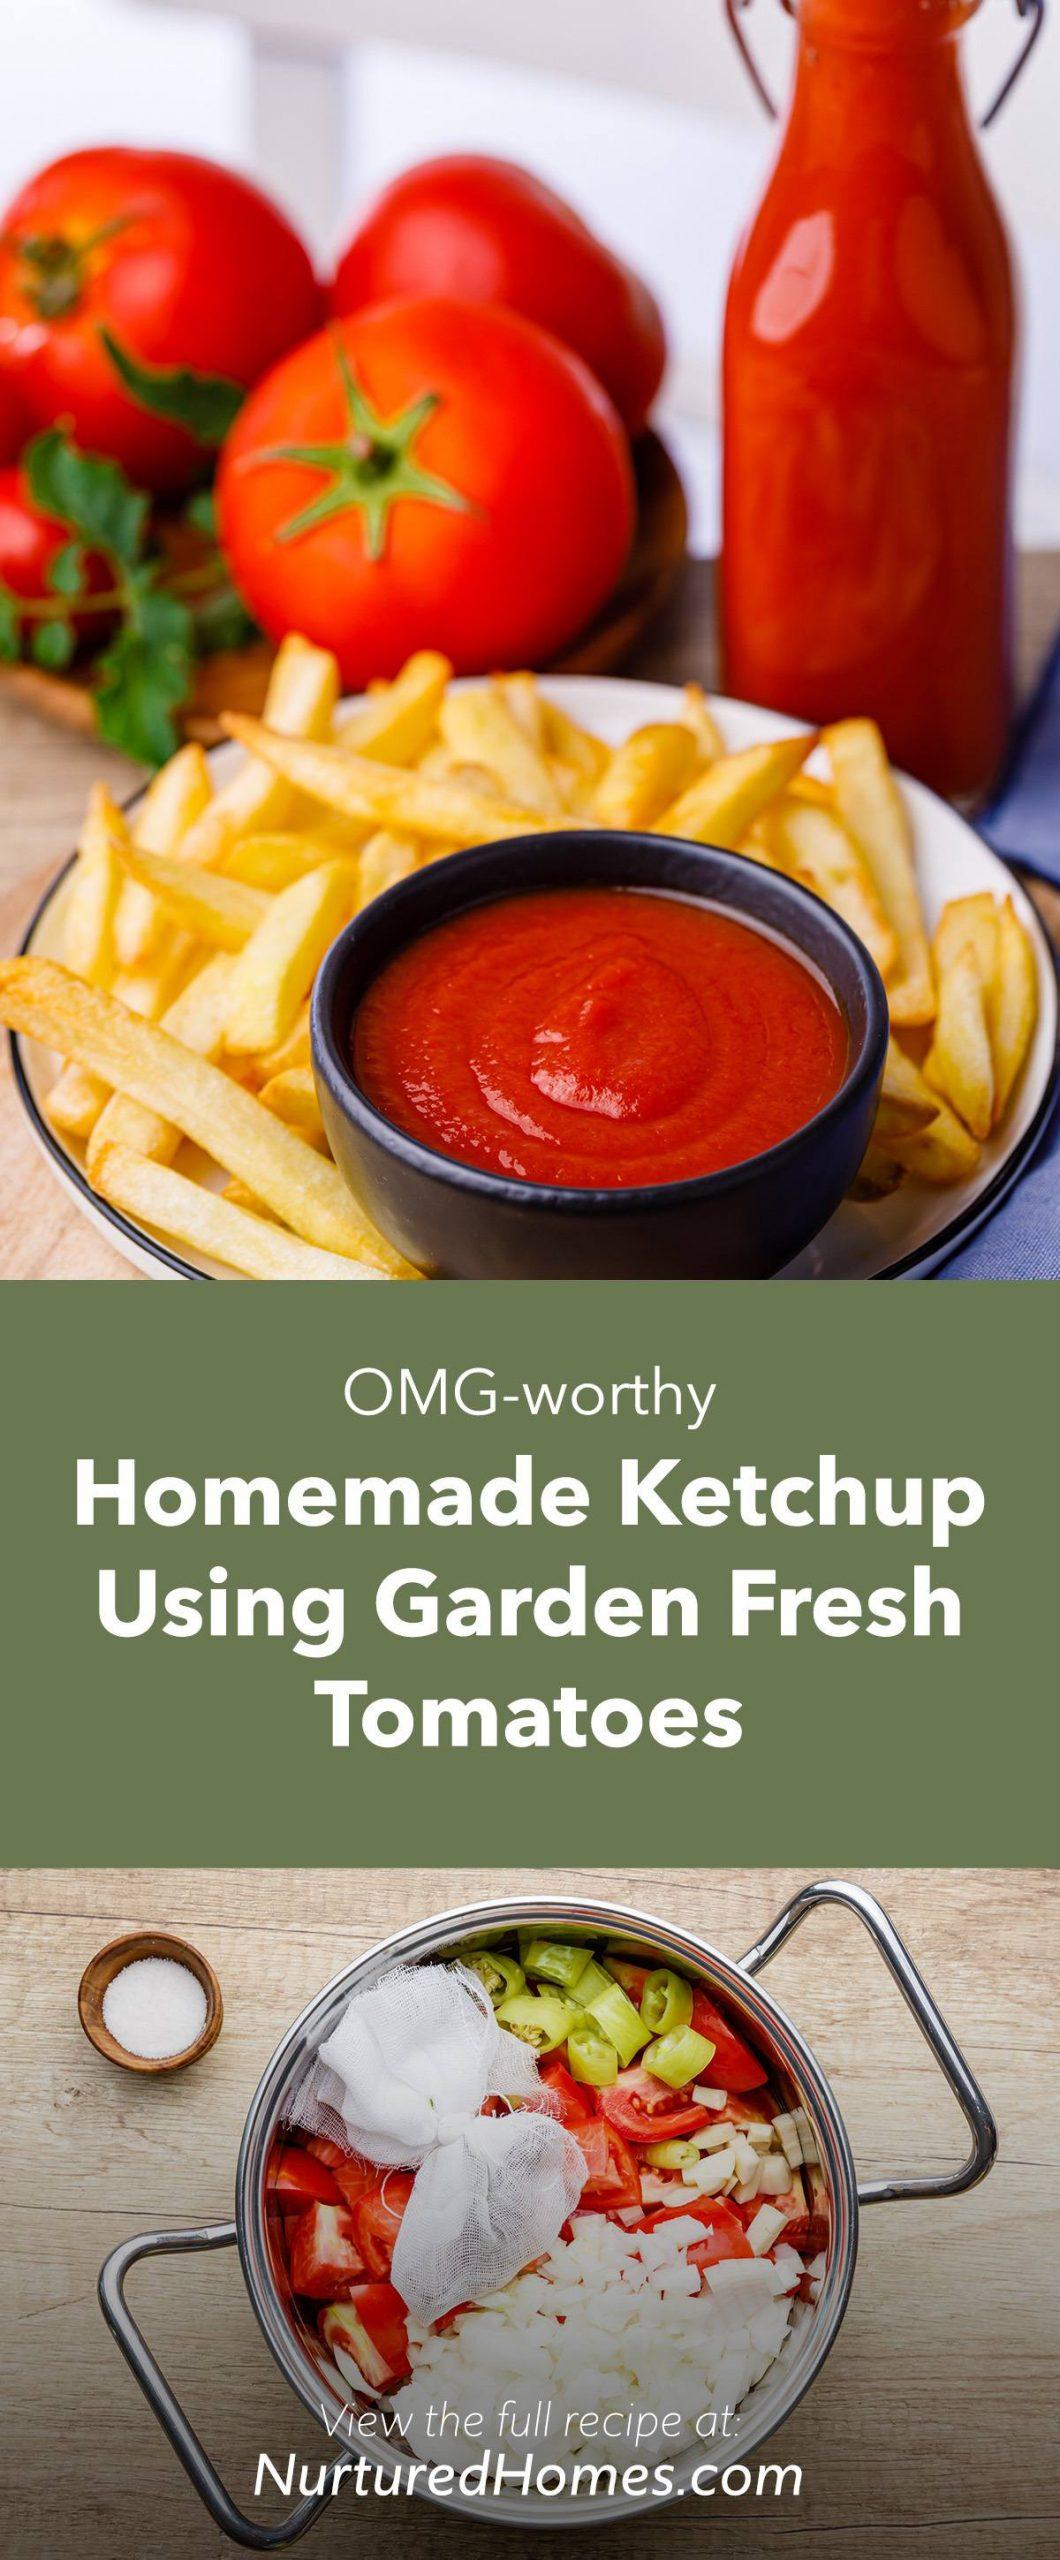 OMG-worthy Homemade Ketchup Using Garden Fresh Tomatoes